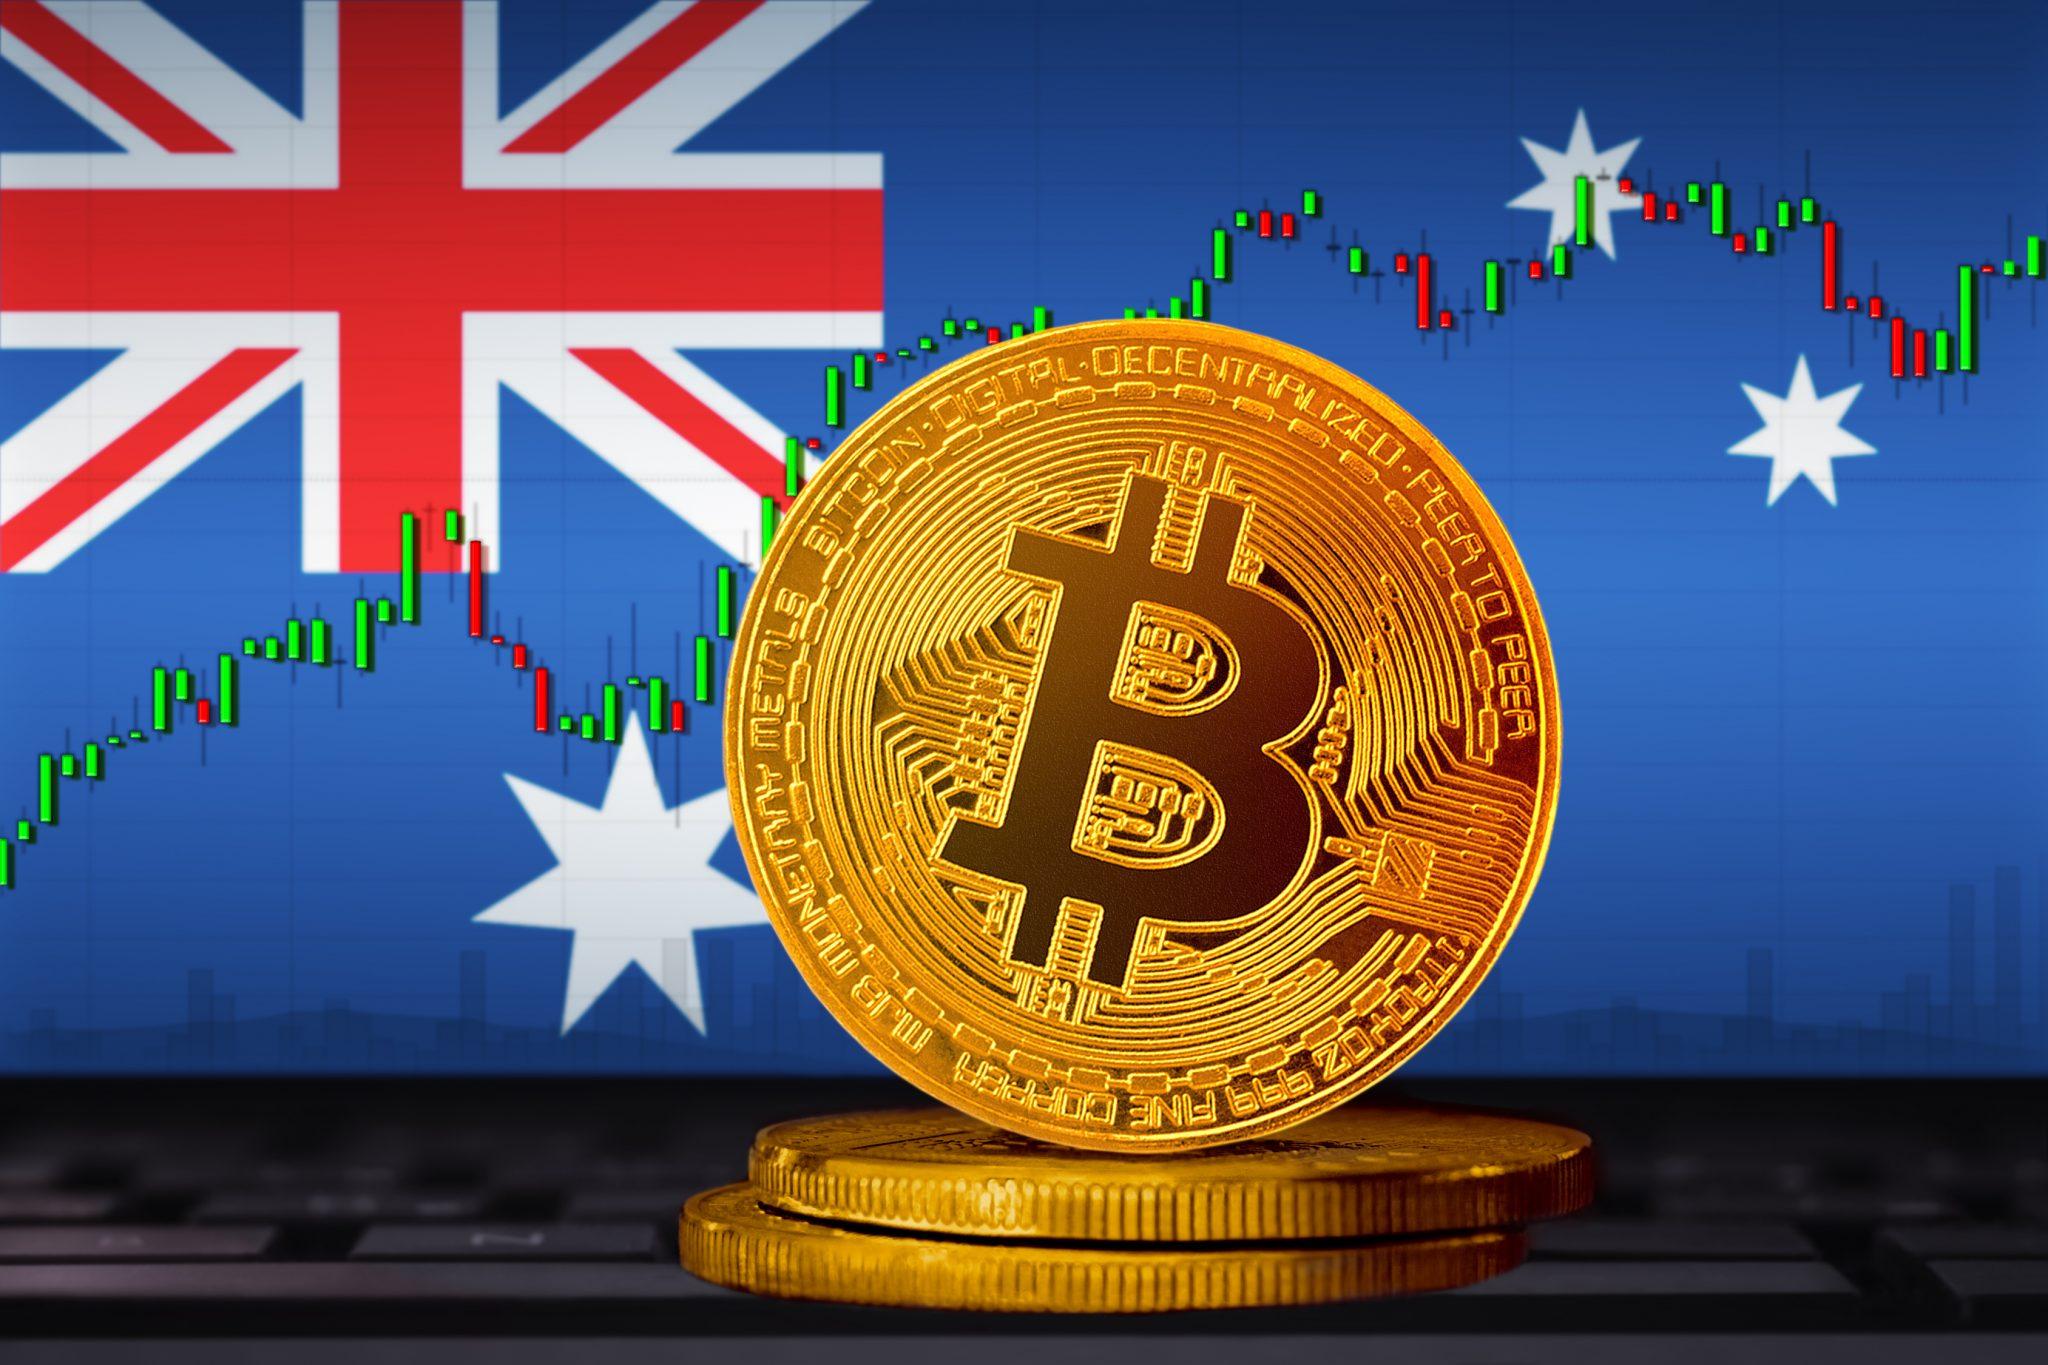 Bitcoin Australia; bitcoin (BTC) coin on the background of the flag of Australia